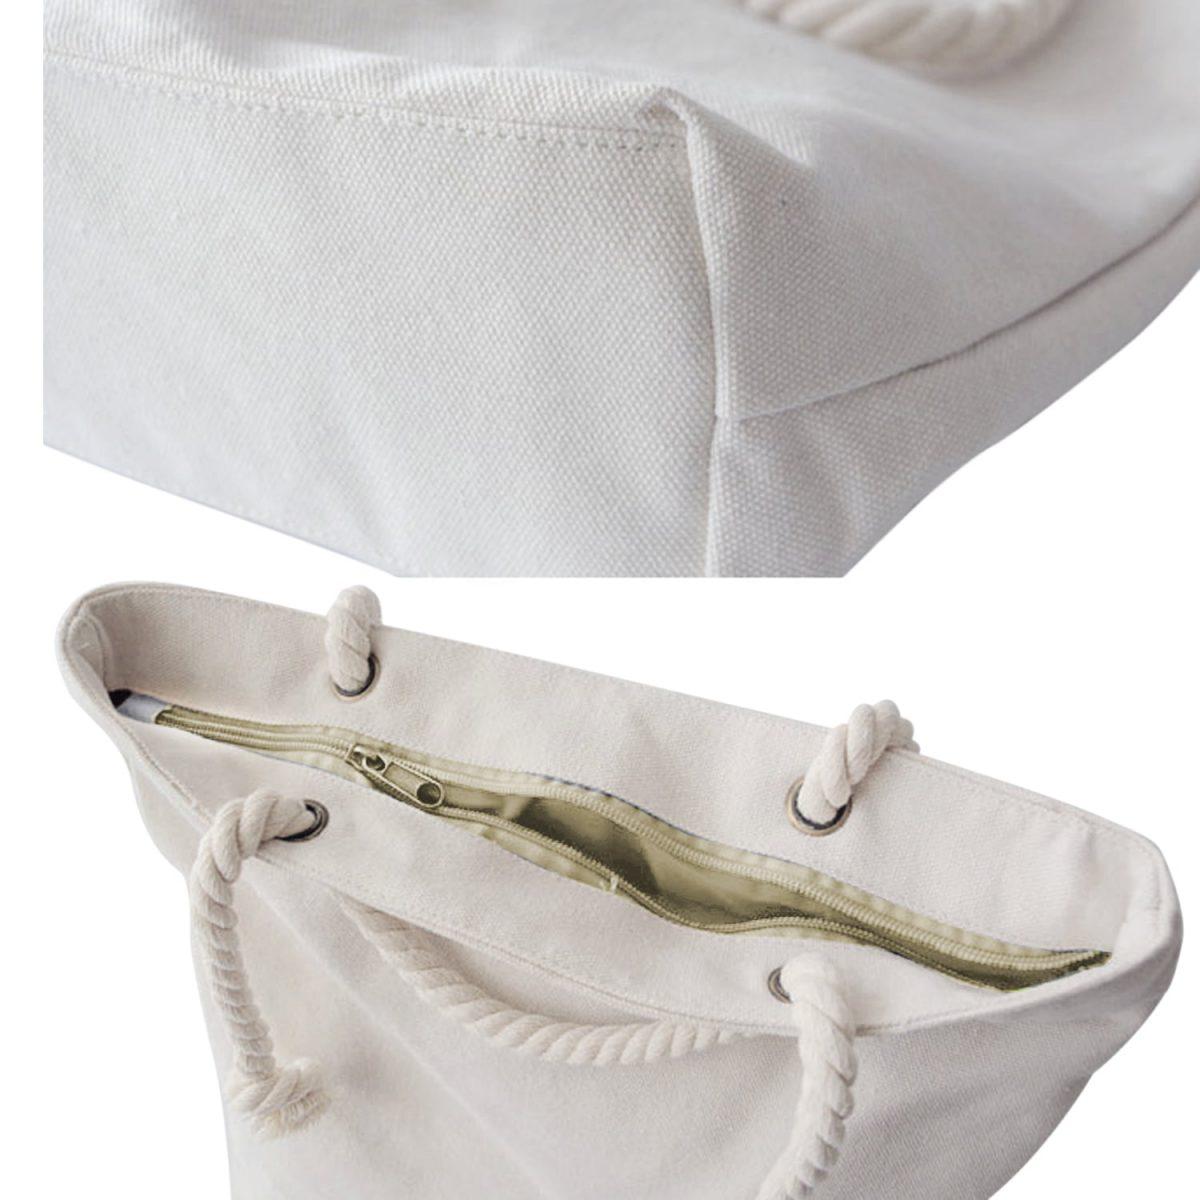 Kavaniçe Kare Desenli Fermuarlı Modern Kumaş Çanta Realhomes